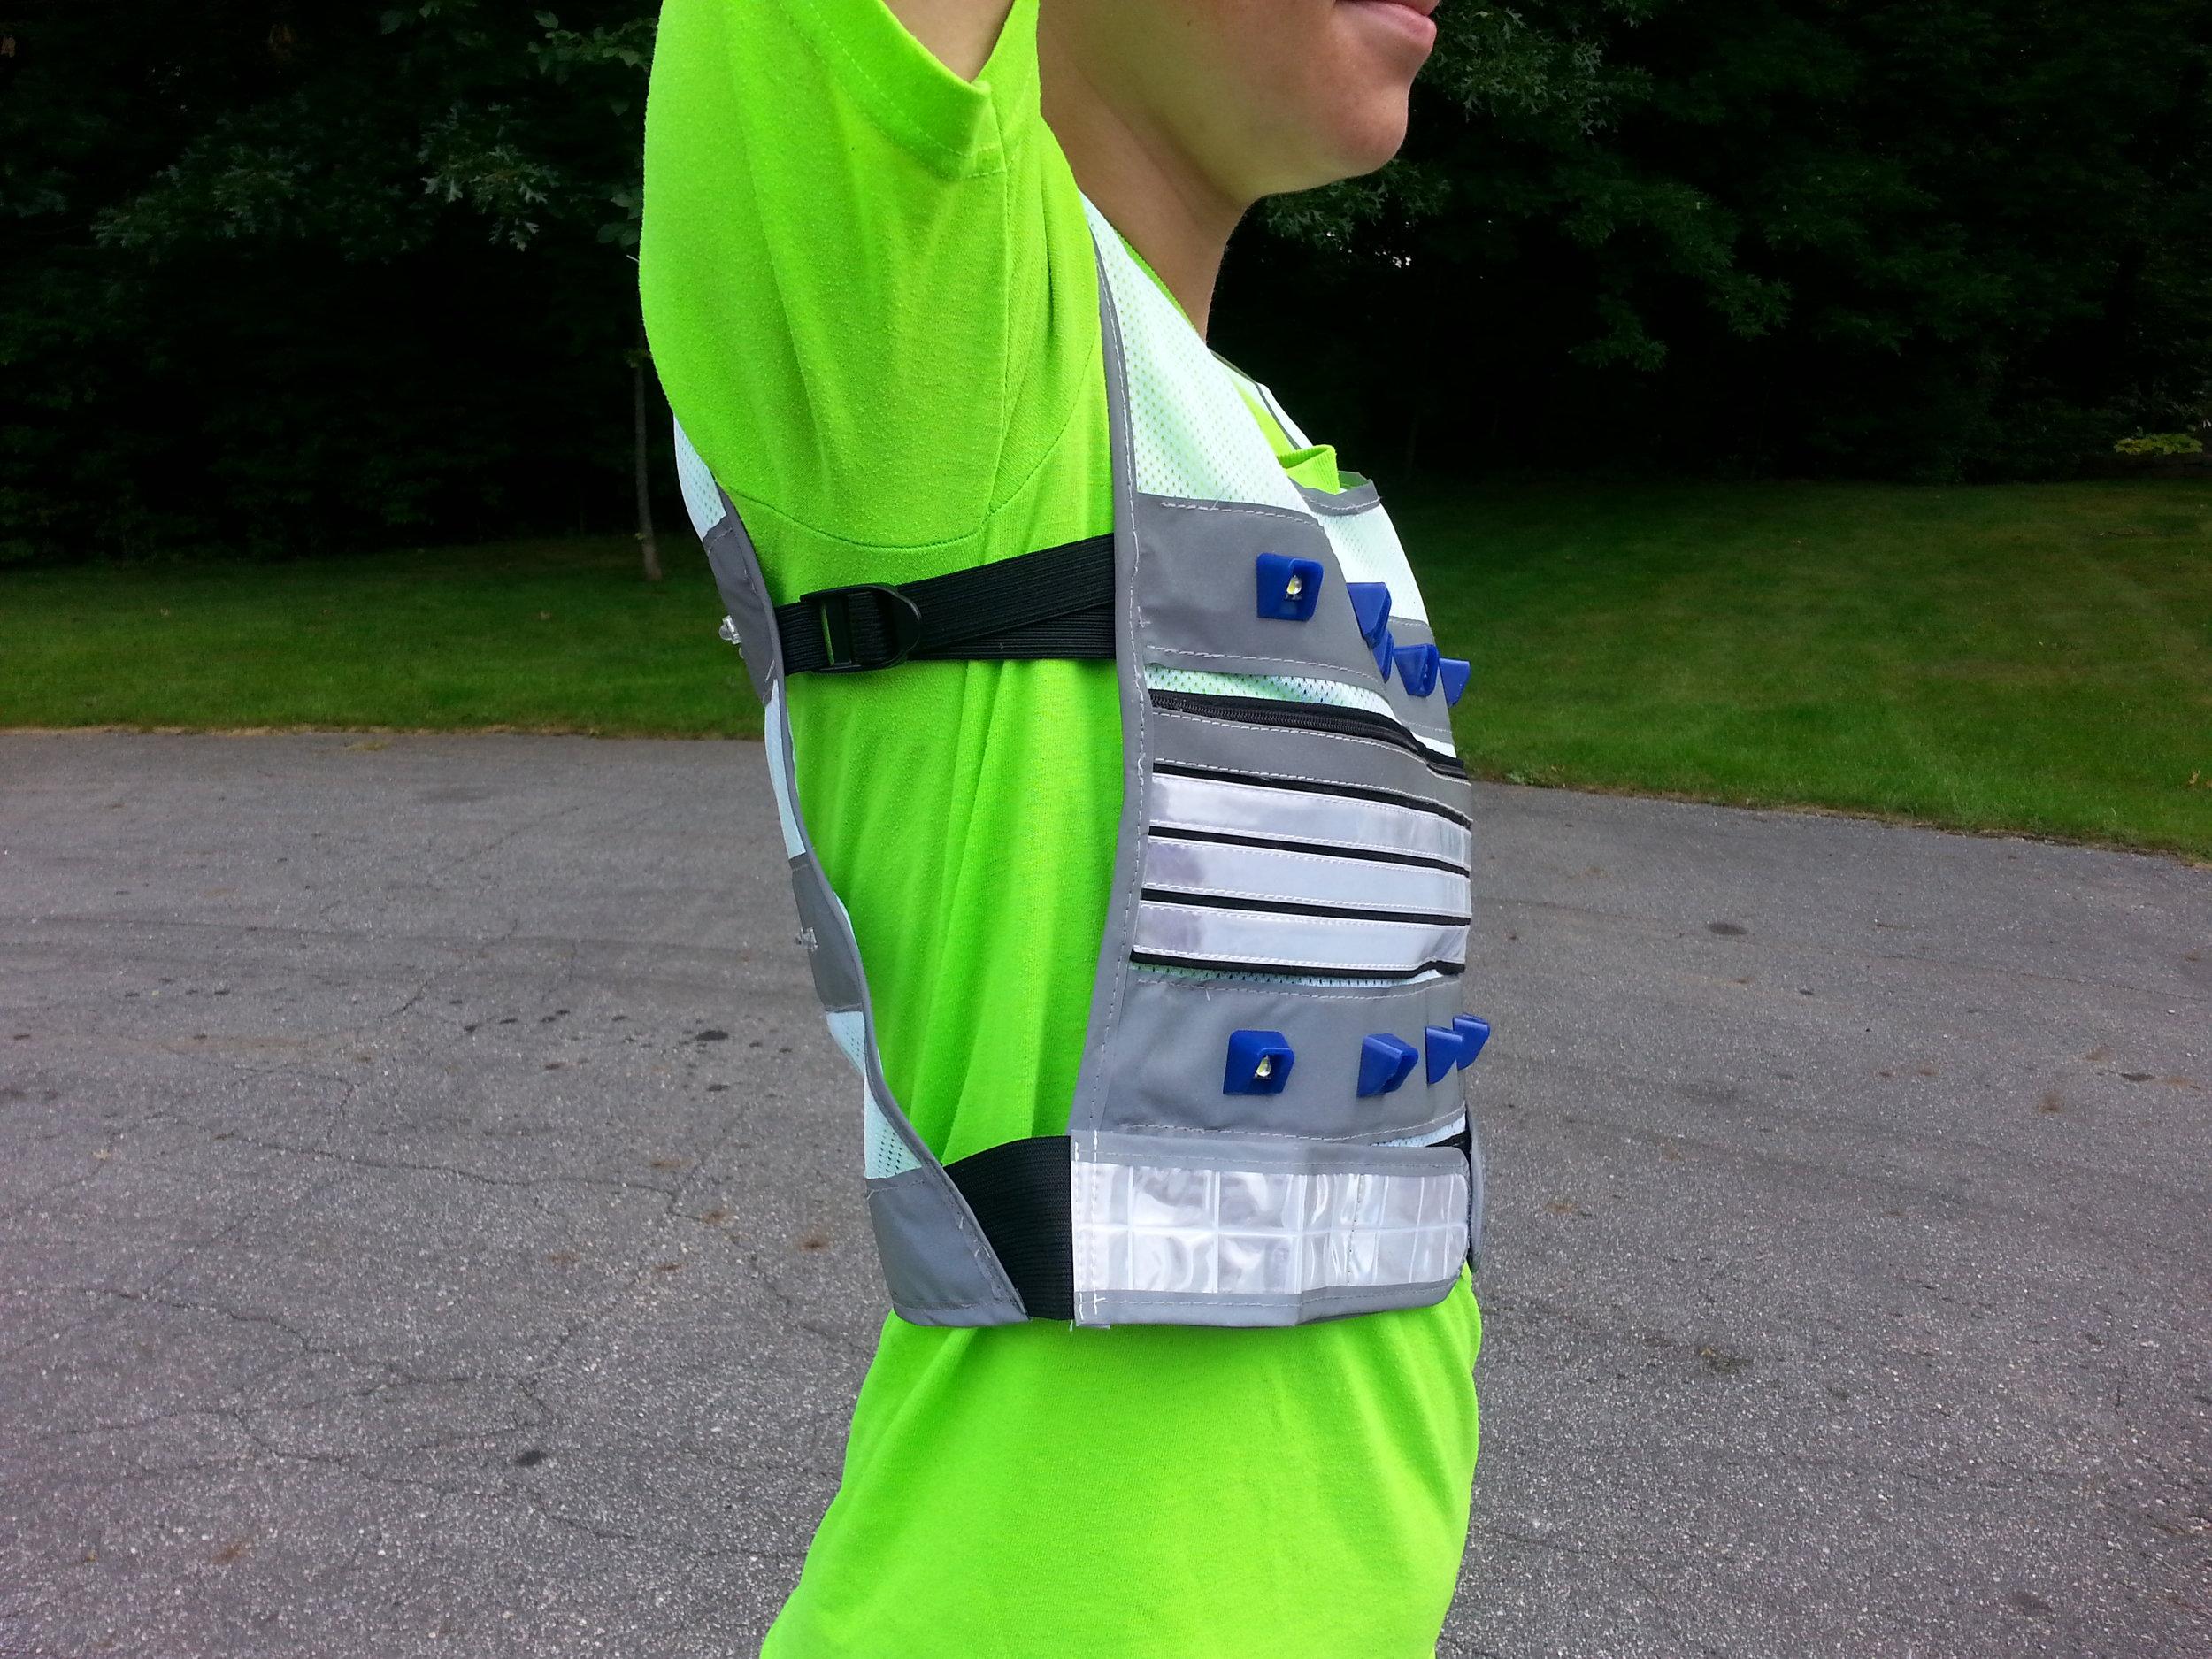 LEDLightvest-small-strap-safety-vest-experts----Grand Rapids-MI.jpg